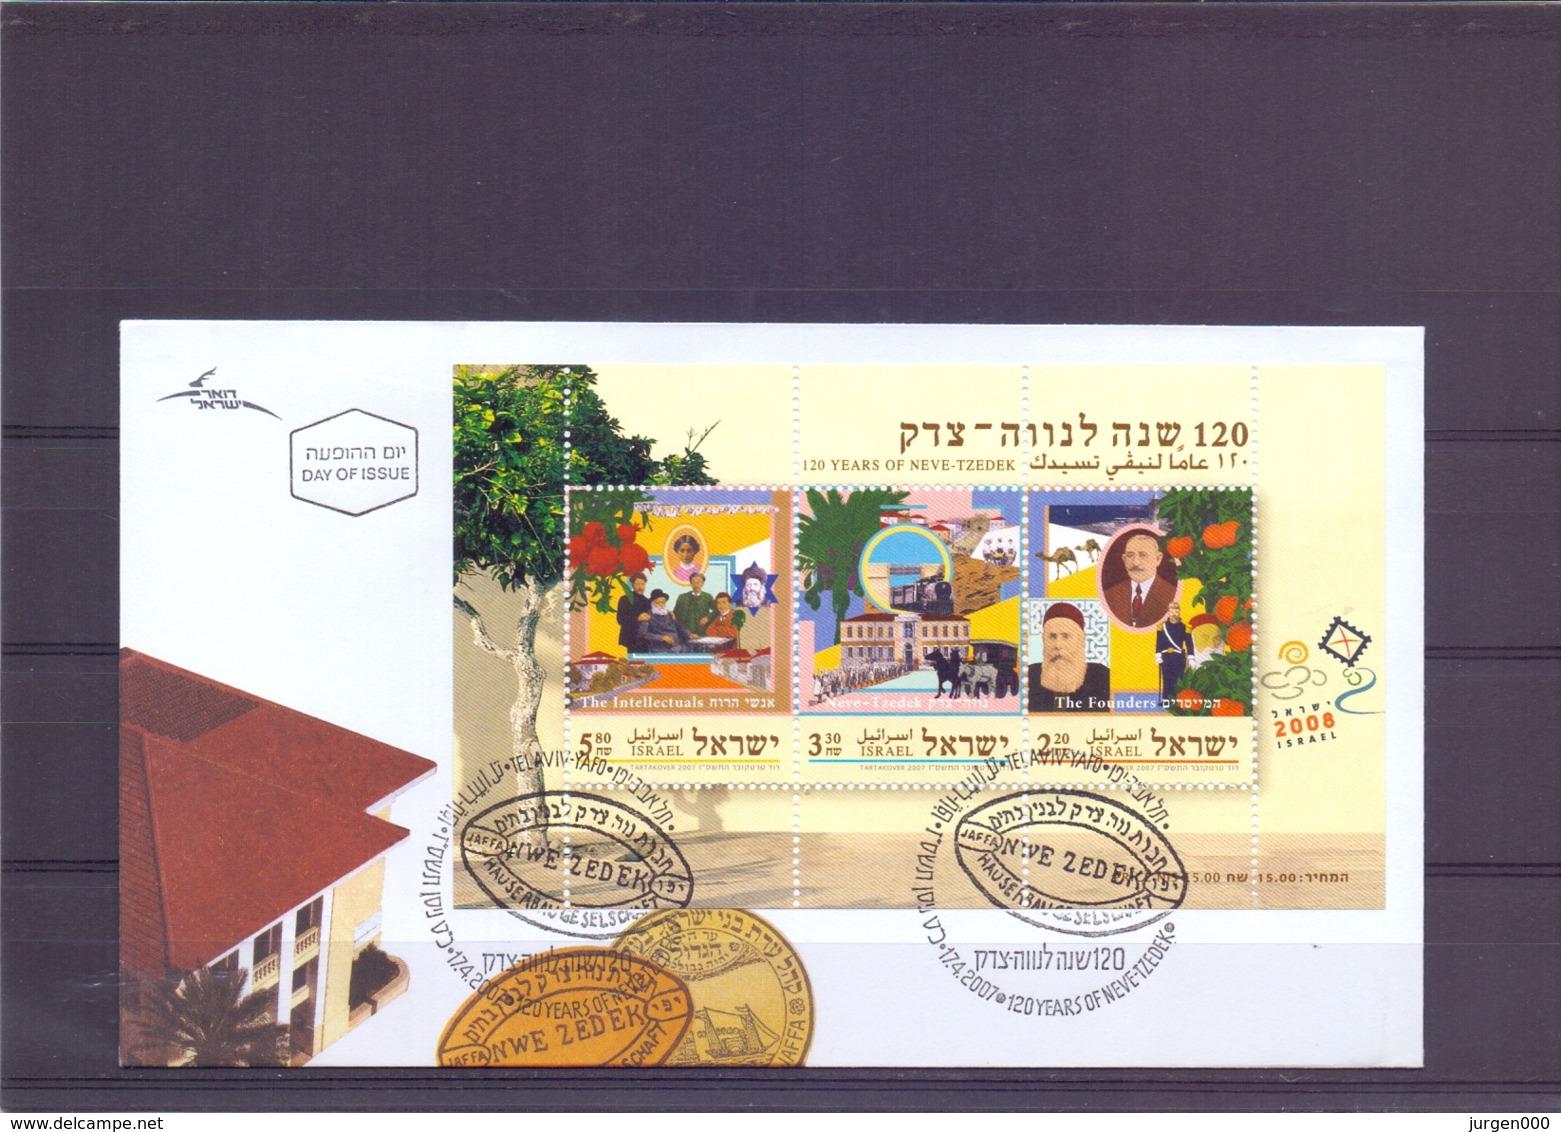 Israel - FDC - 120 Years Of Neve-Tzedek -  Michel Block 75   - 17/4/2007   (RM14845) - Israel